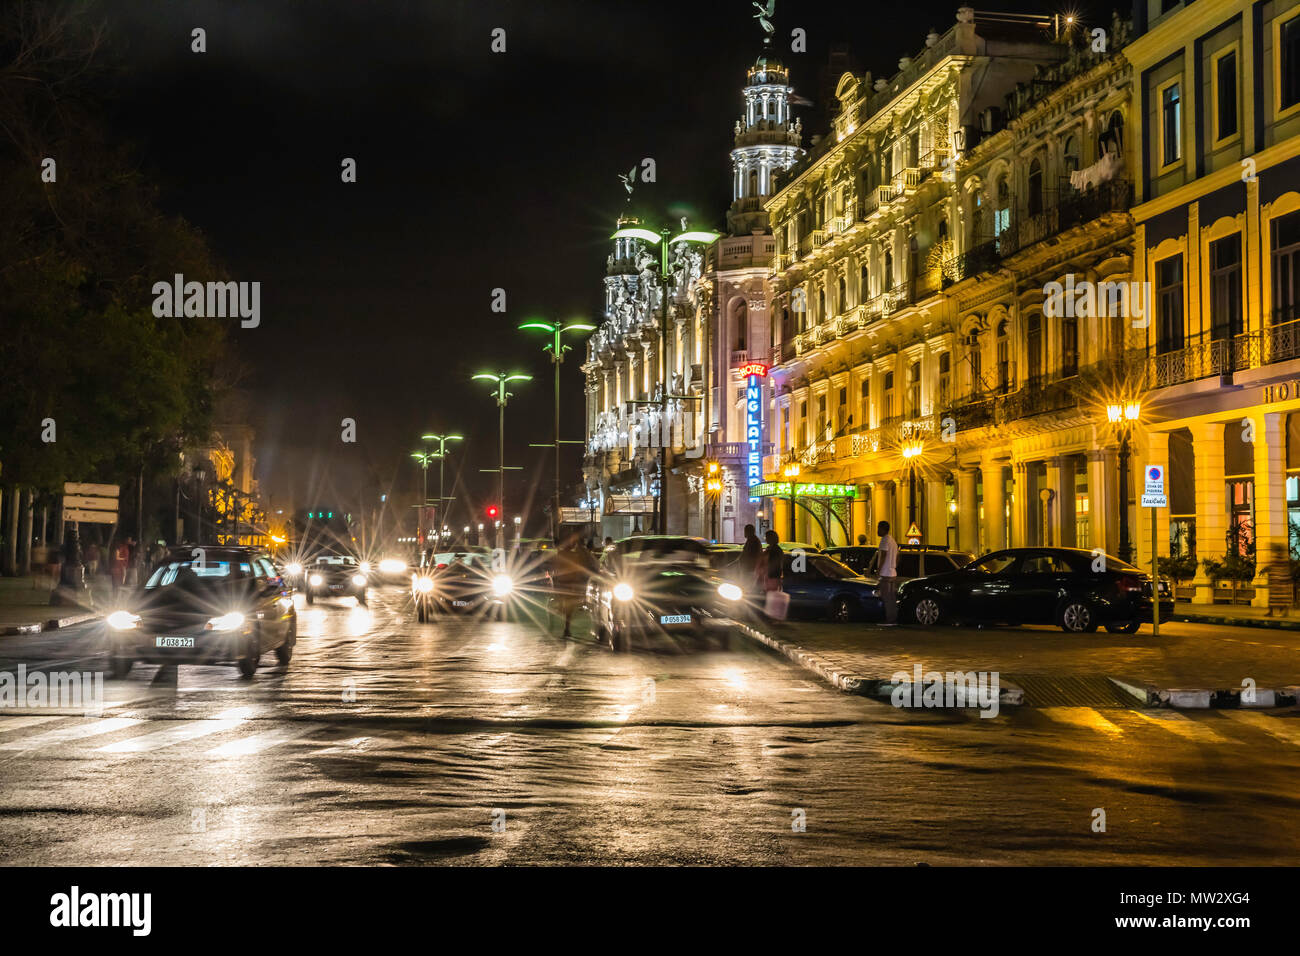 Cityscape view of the Hotel Inglaterra taken at night, taken from the Prado in old Havana, Cuba. - Stock Image